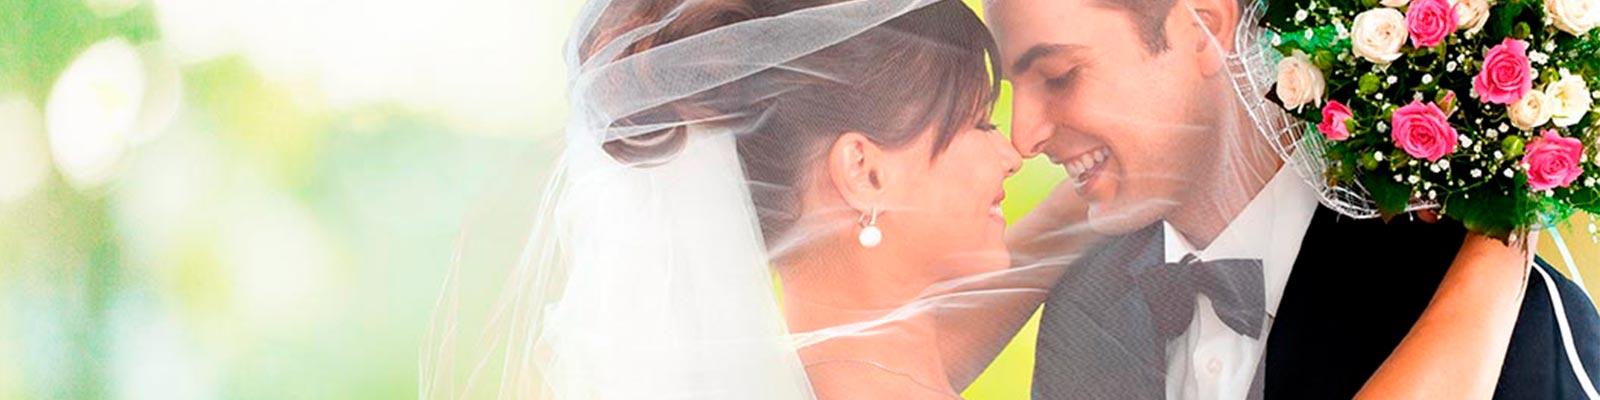 bomboniere e sacchetti matrimonio